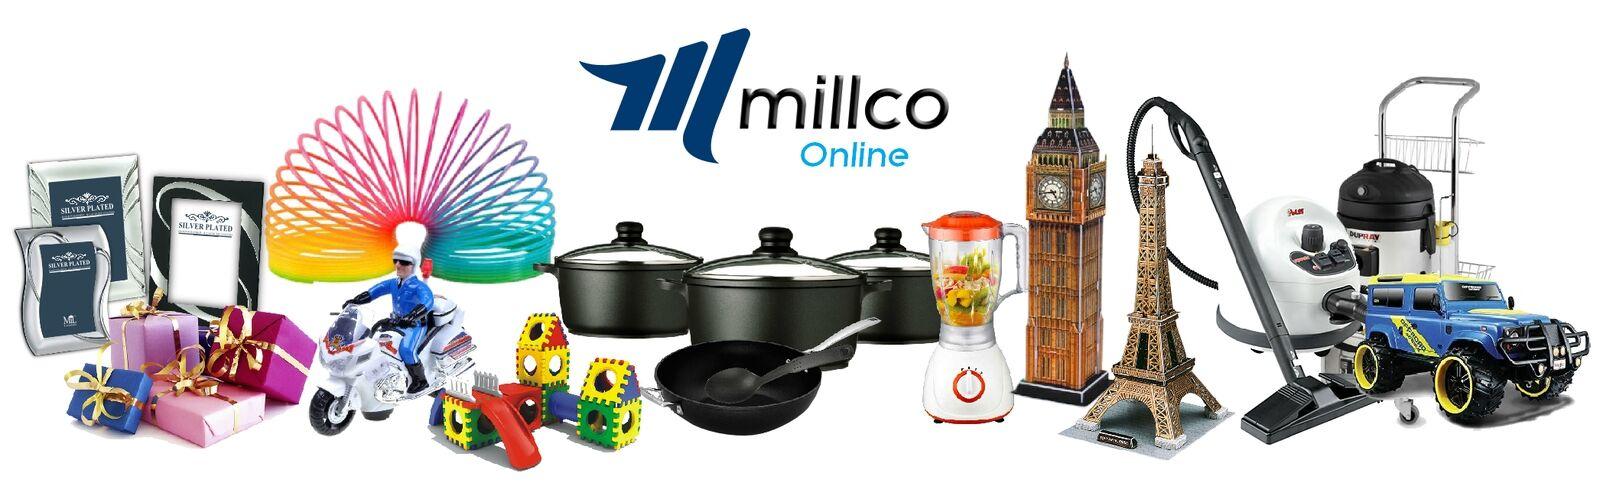 millco_online